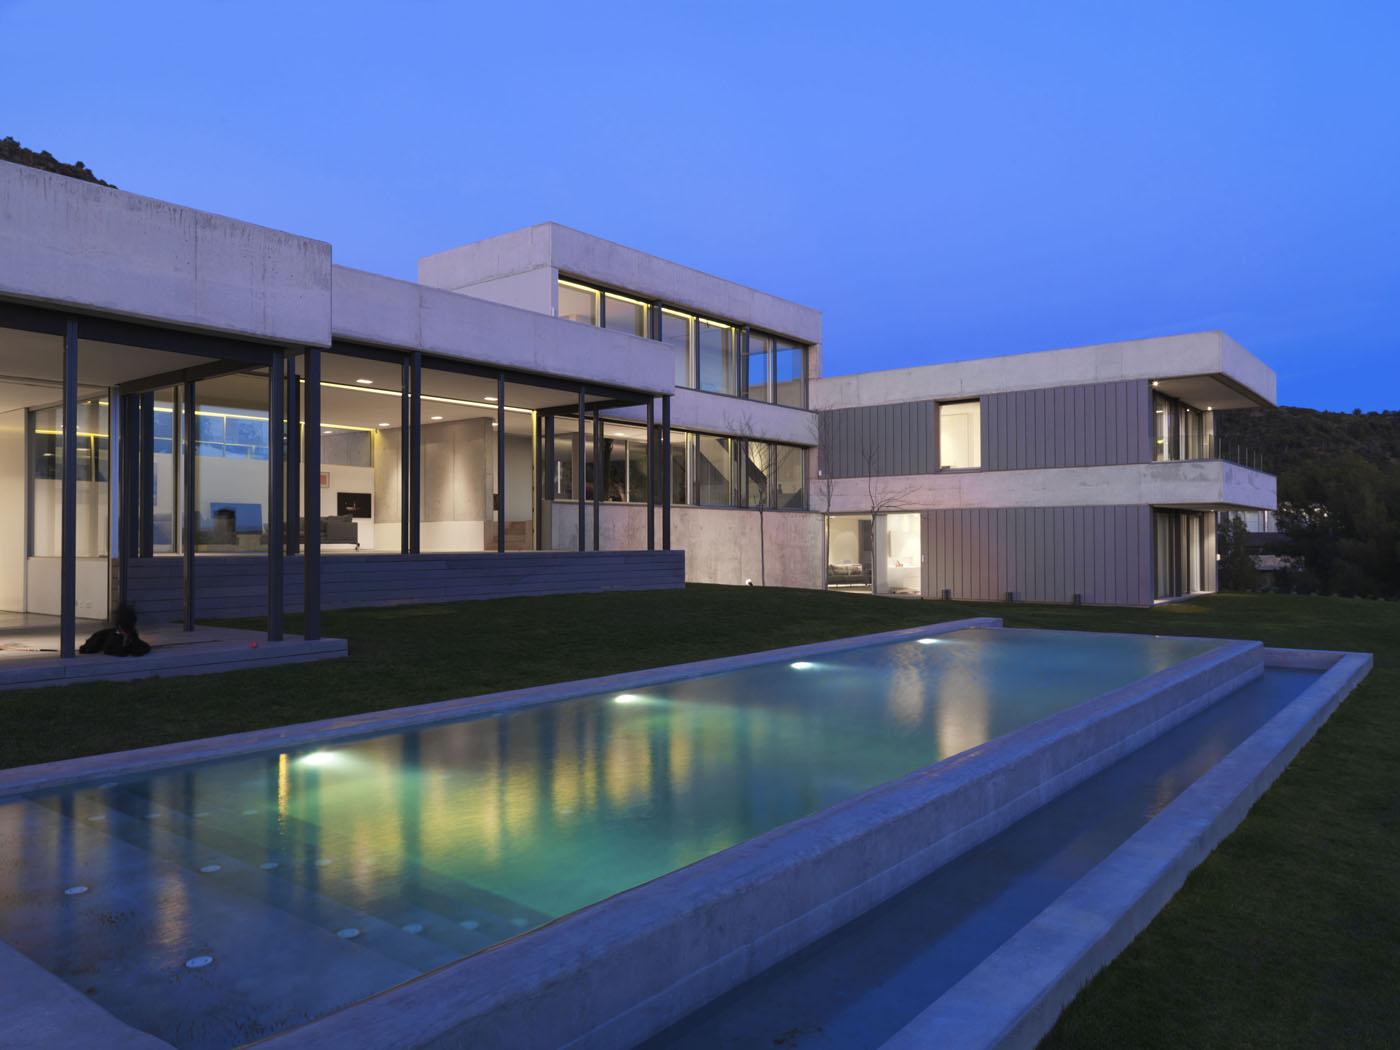 Arquitectos tu00e9cnicos mu00e1s influyentes segu00fan Klout (II)